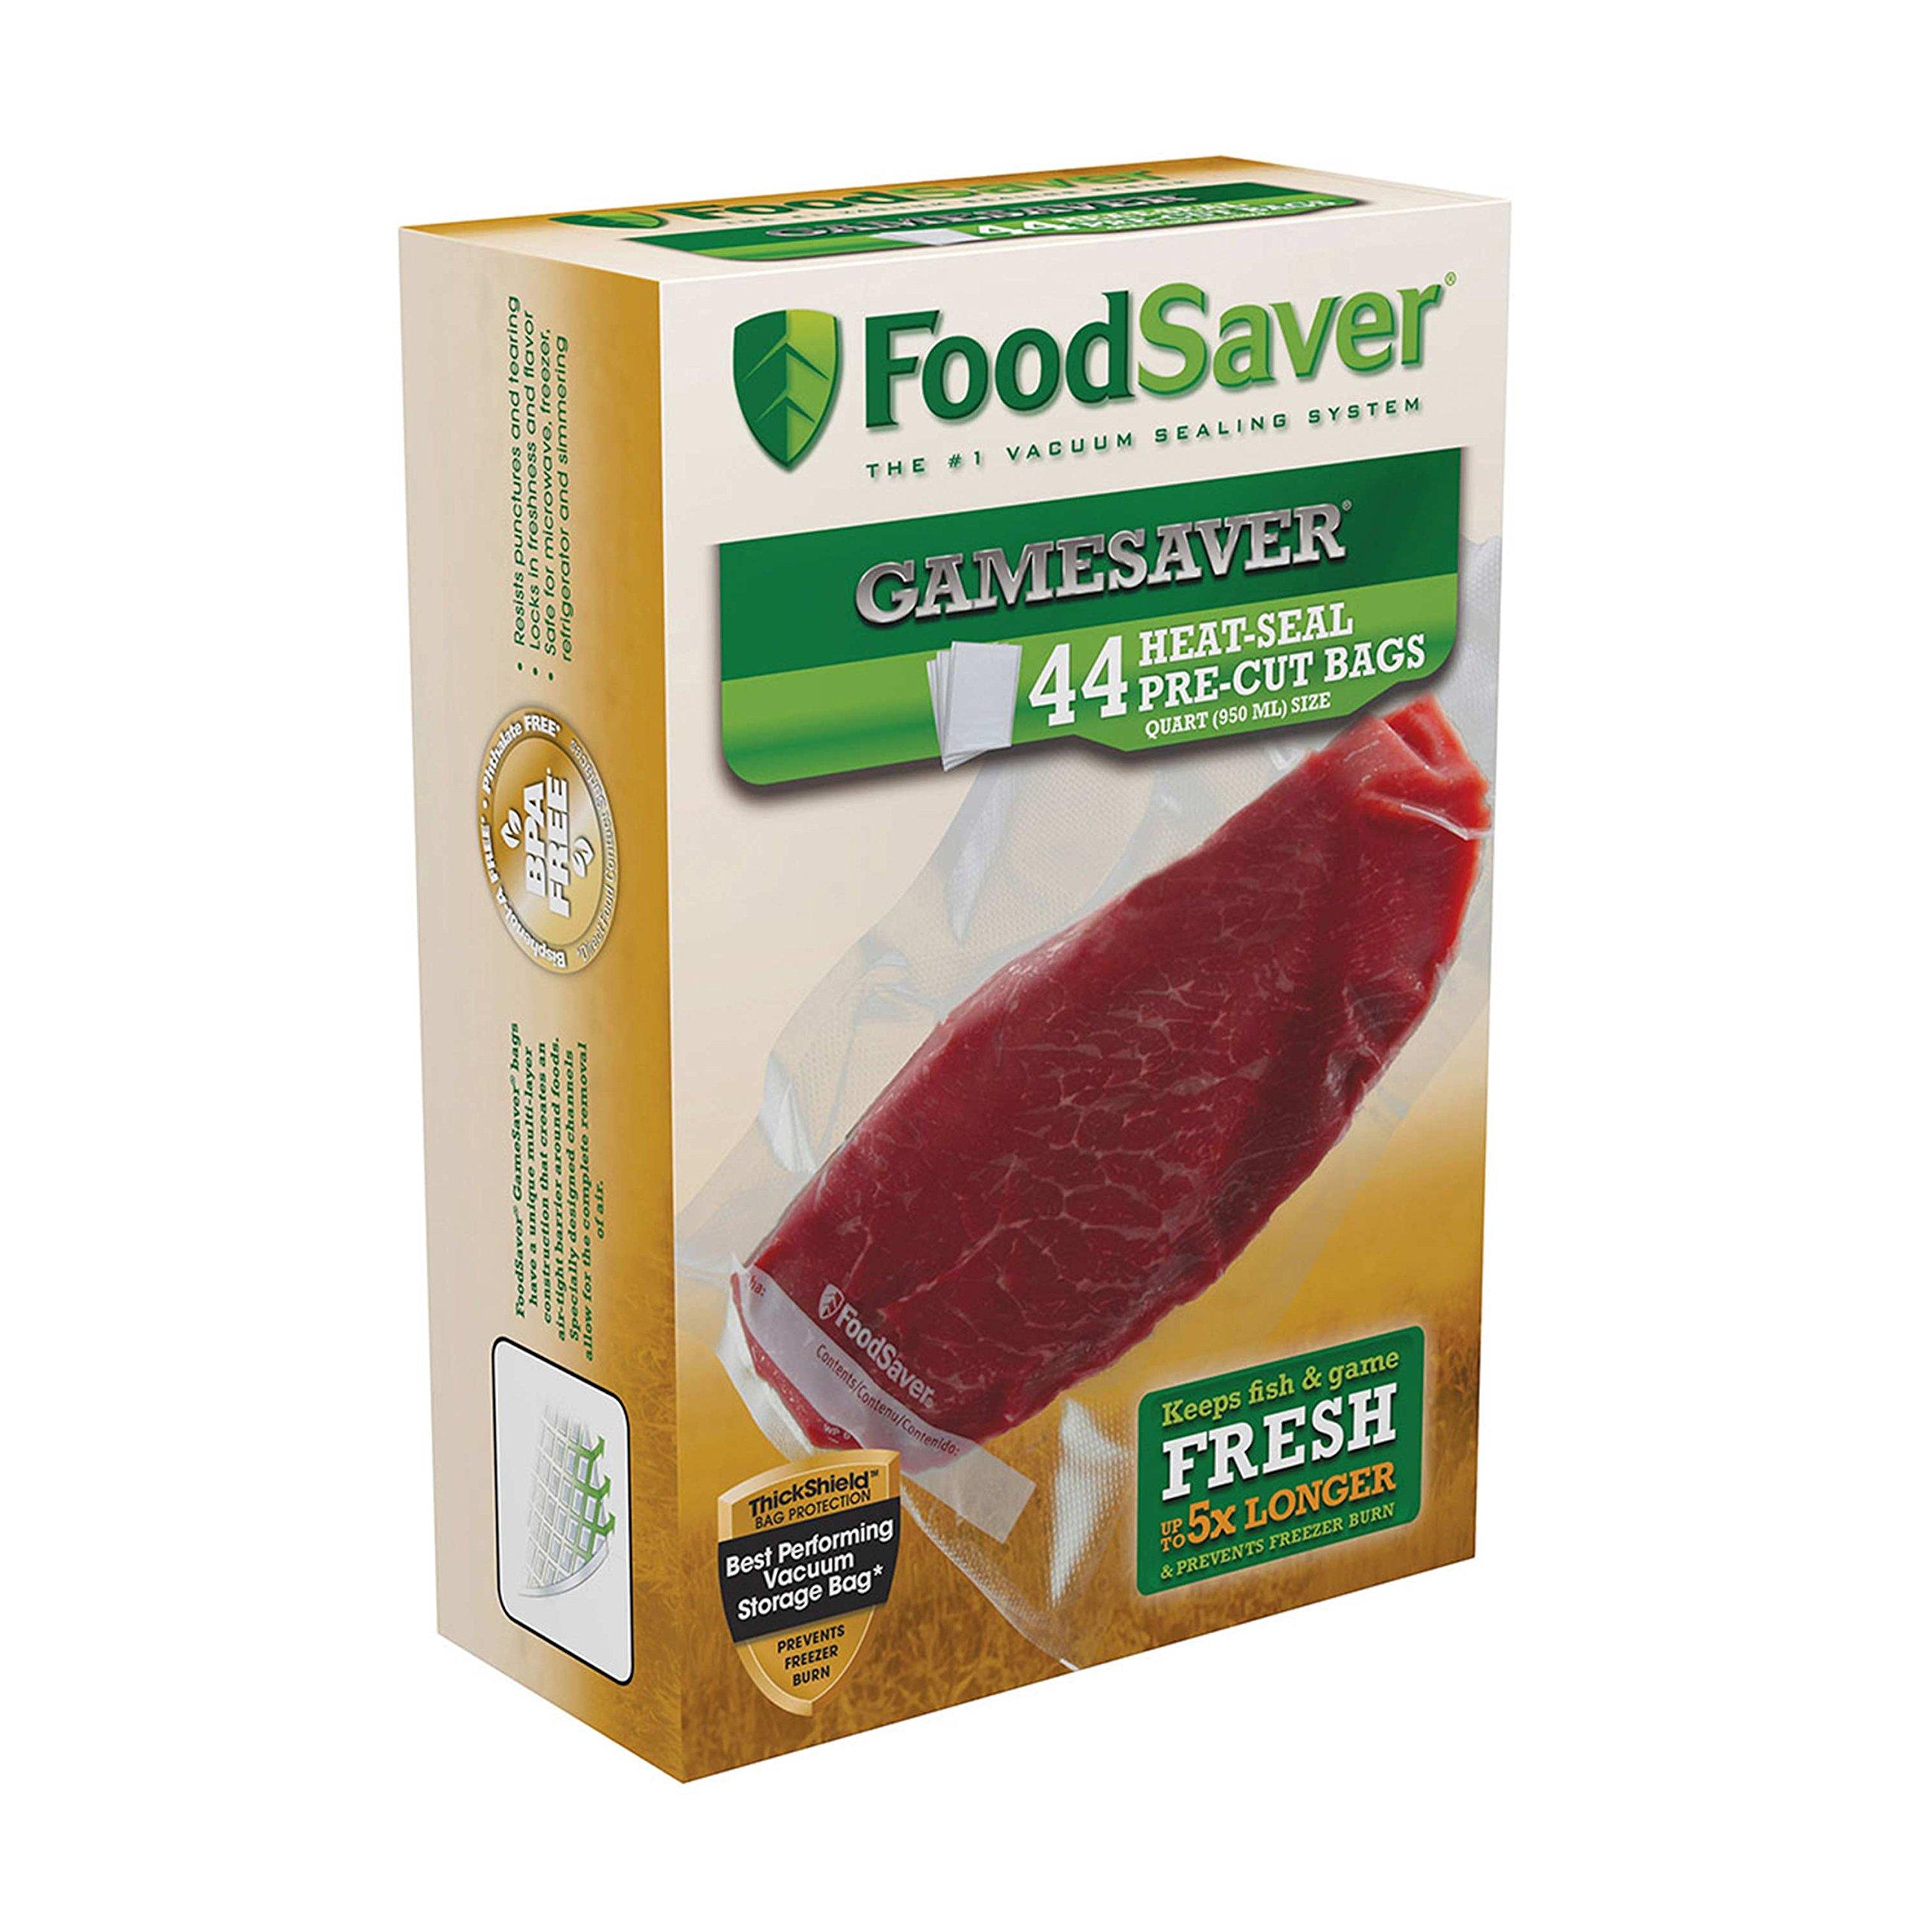 FoodSaver GameSaver 1 Quart Vacuum Seal Bag with BPA-Free Multilayer Construction, 44 Count by FoodSaver